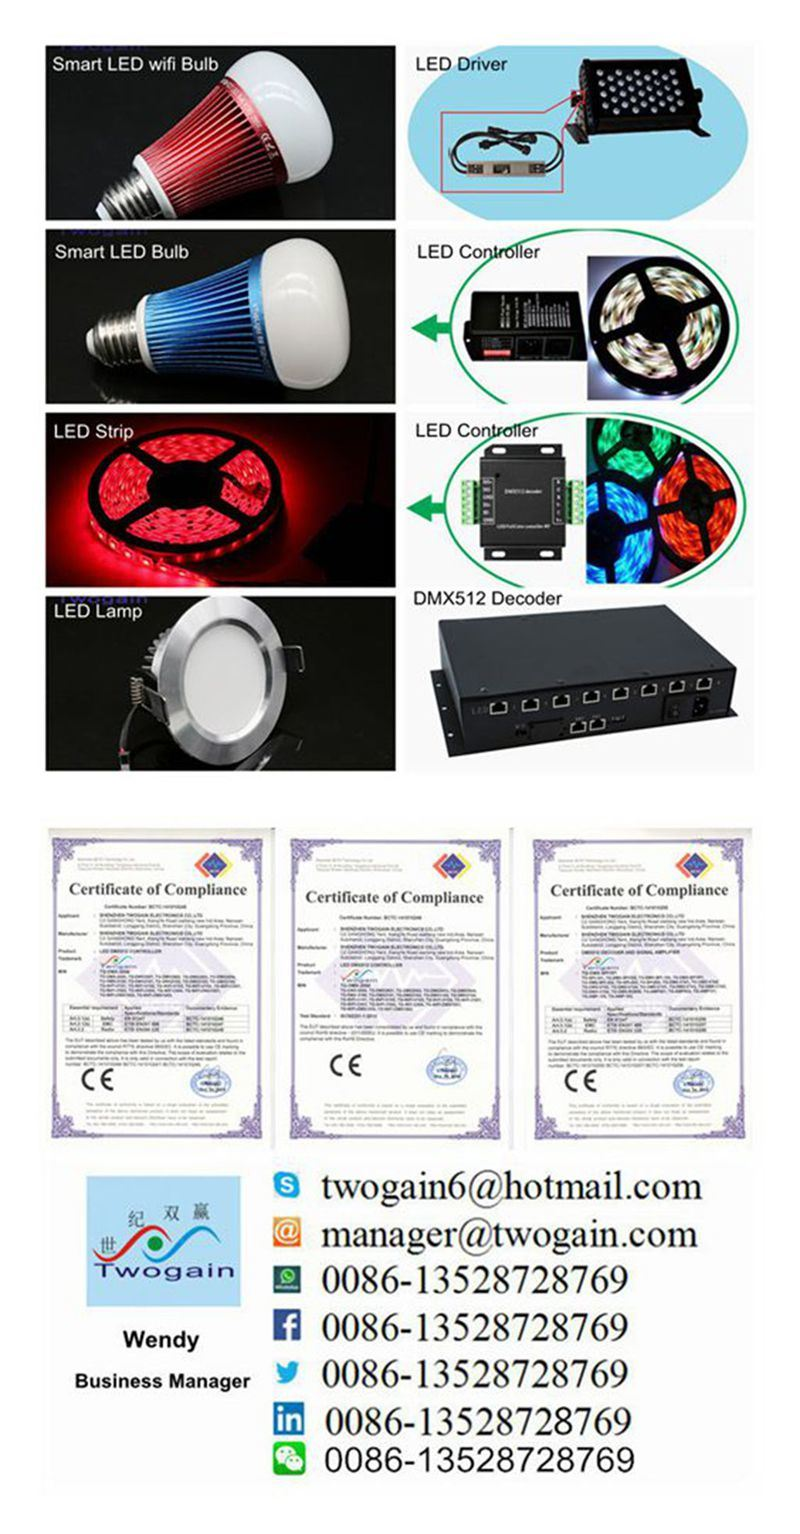 Wholesale Aluminium 8W E27 RGB Smart LED Lighting Housing Energy Saving Smart WiFi Bulb Lamp Light 220V